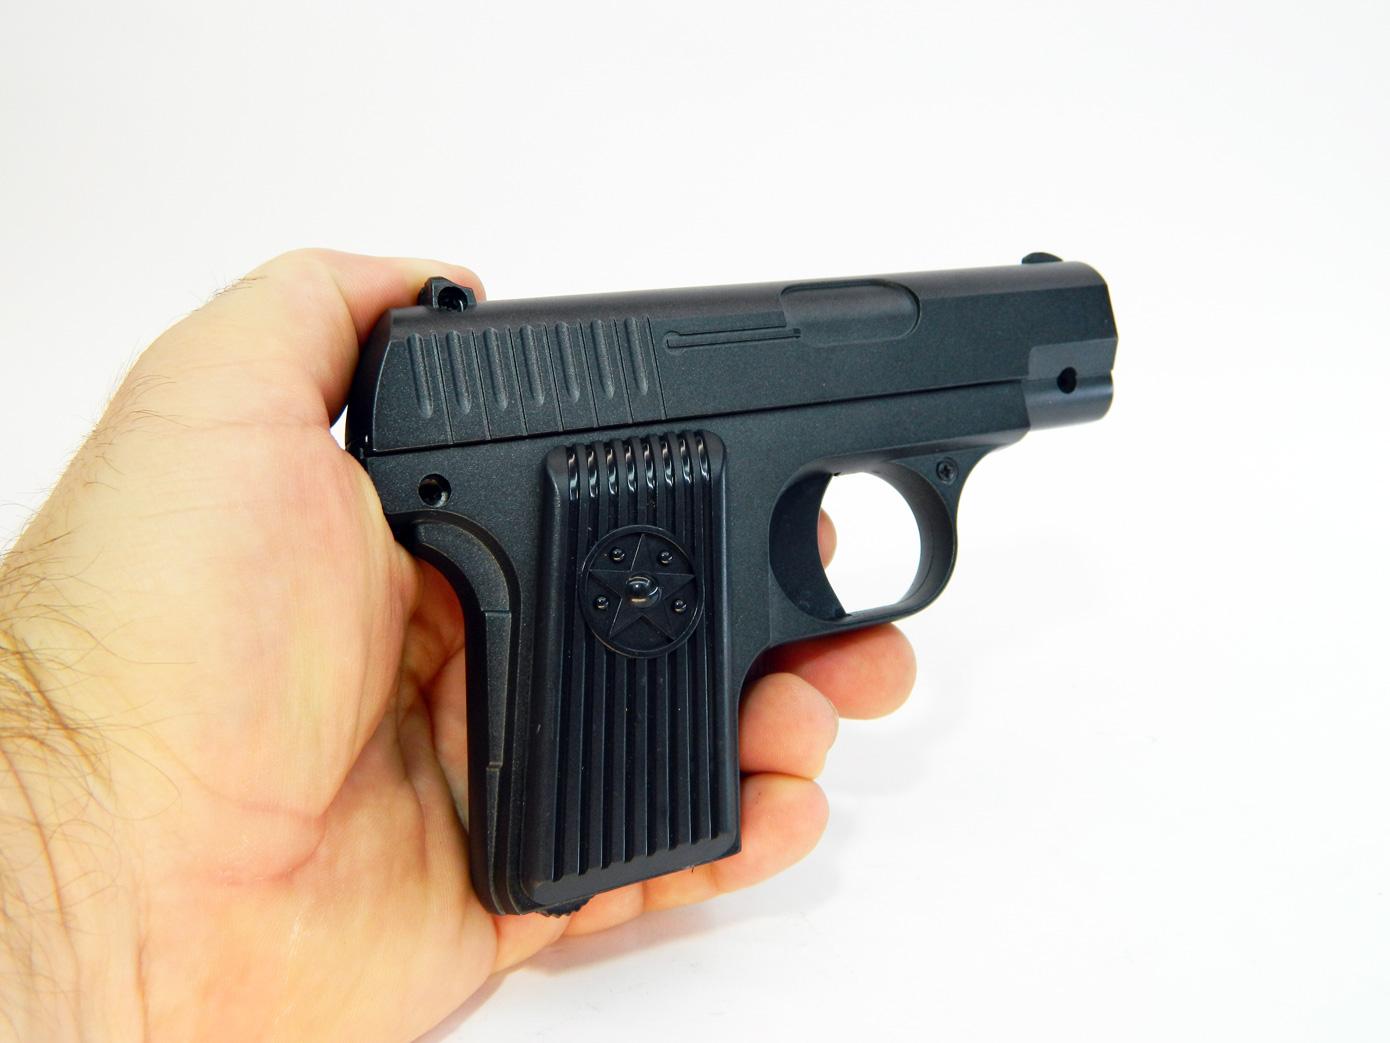 Пистолет ТТ мини изображение 5